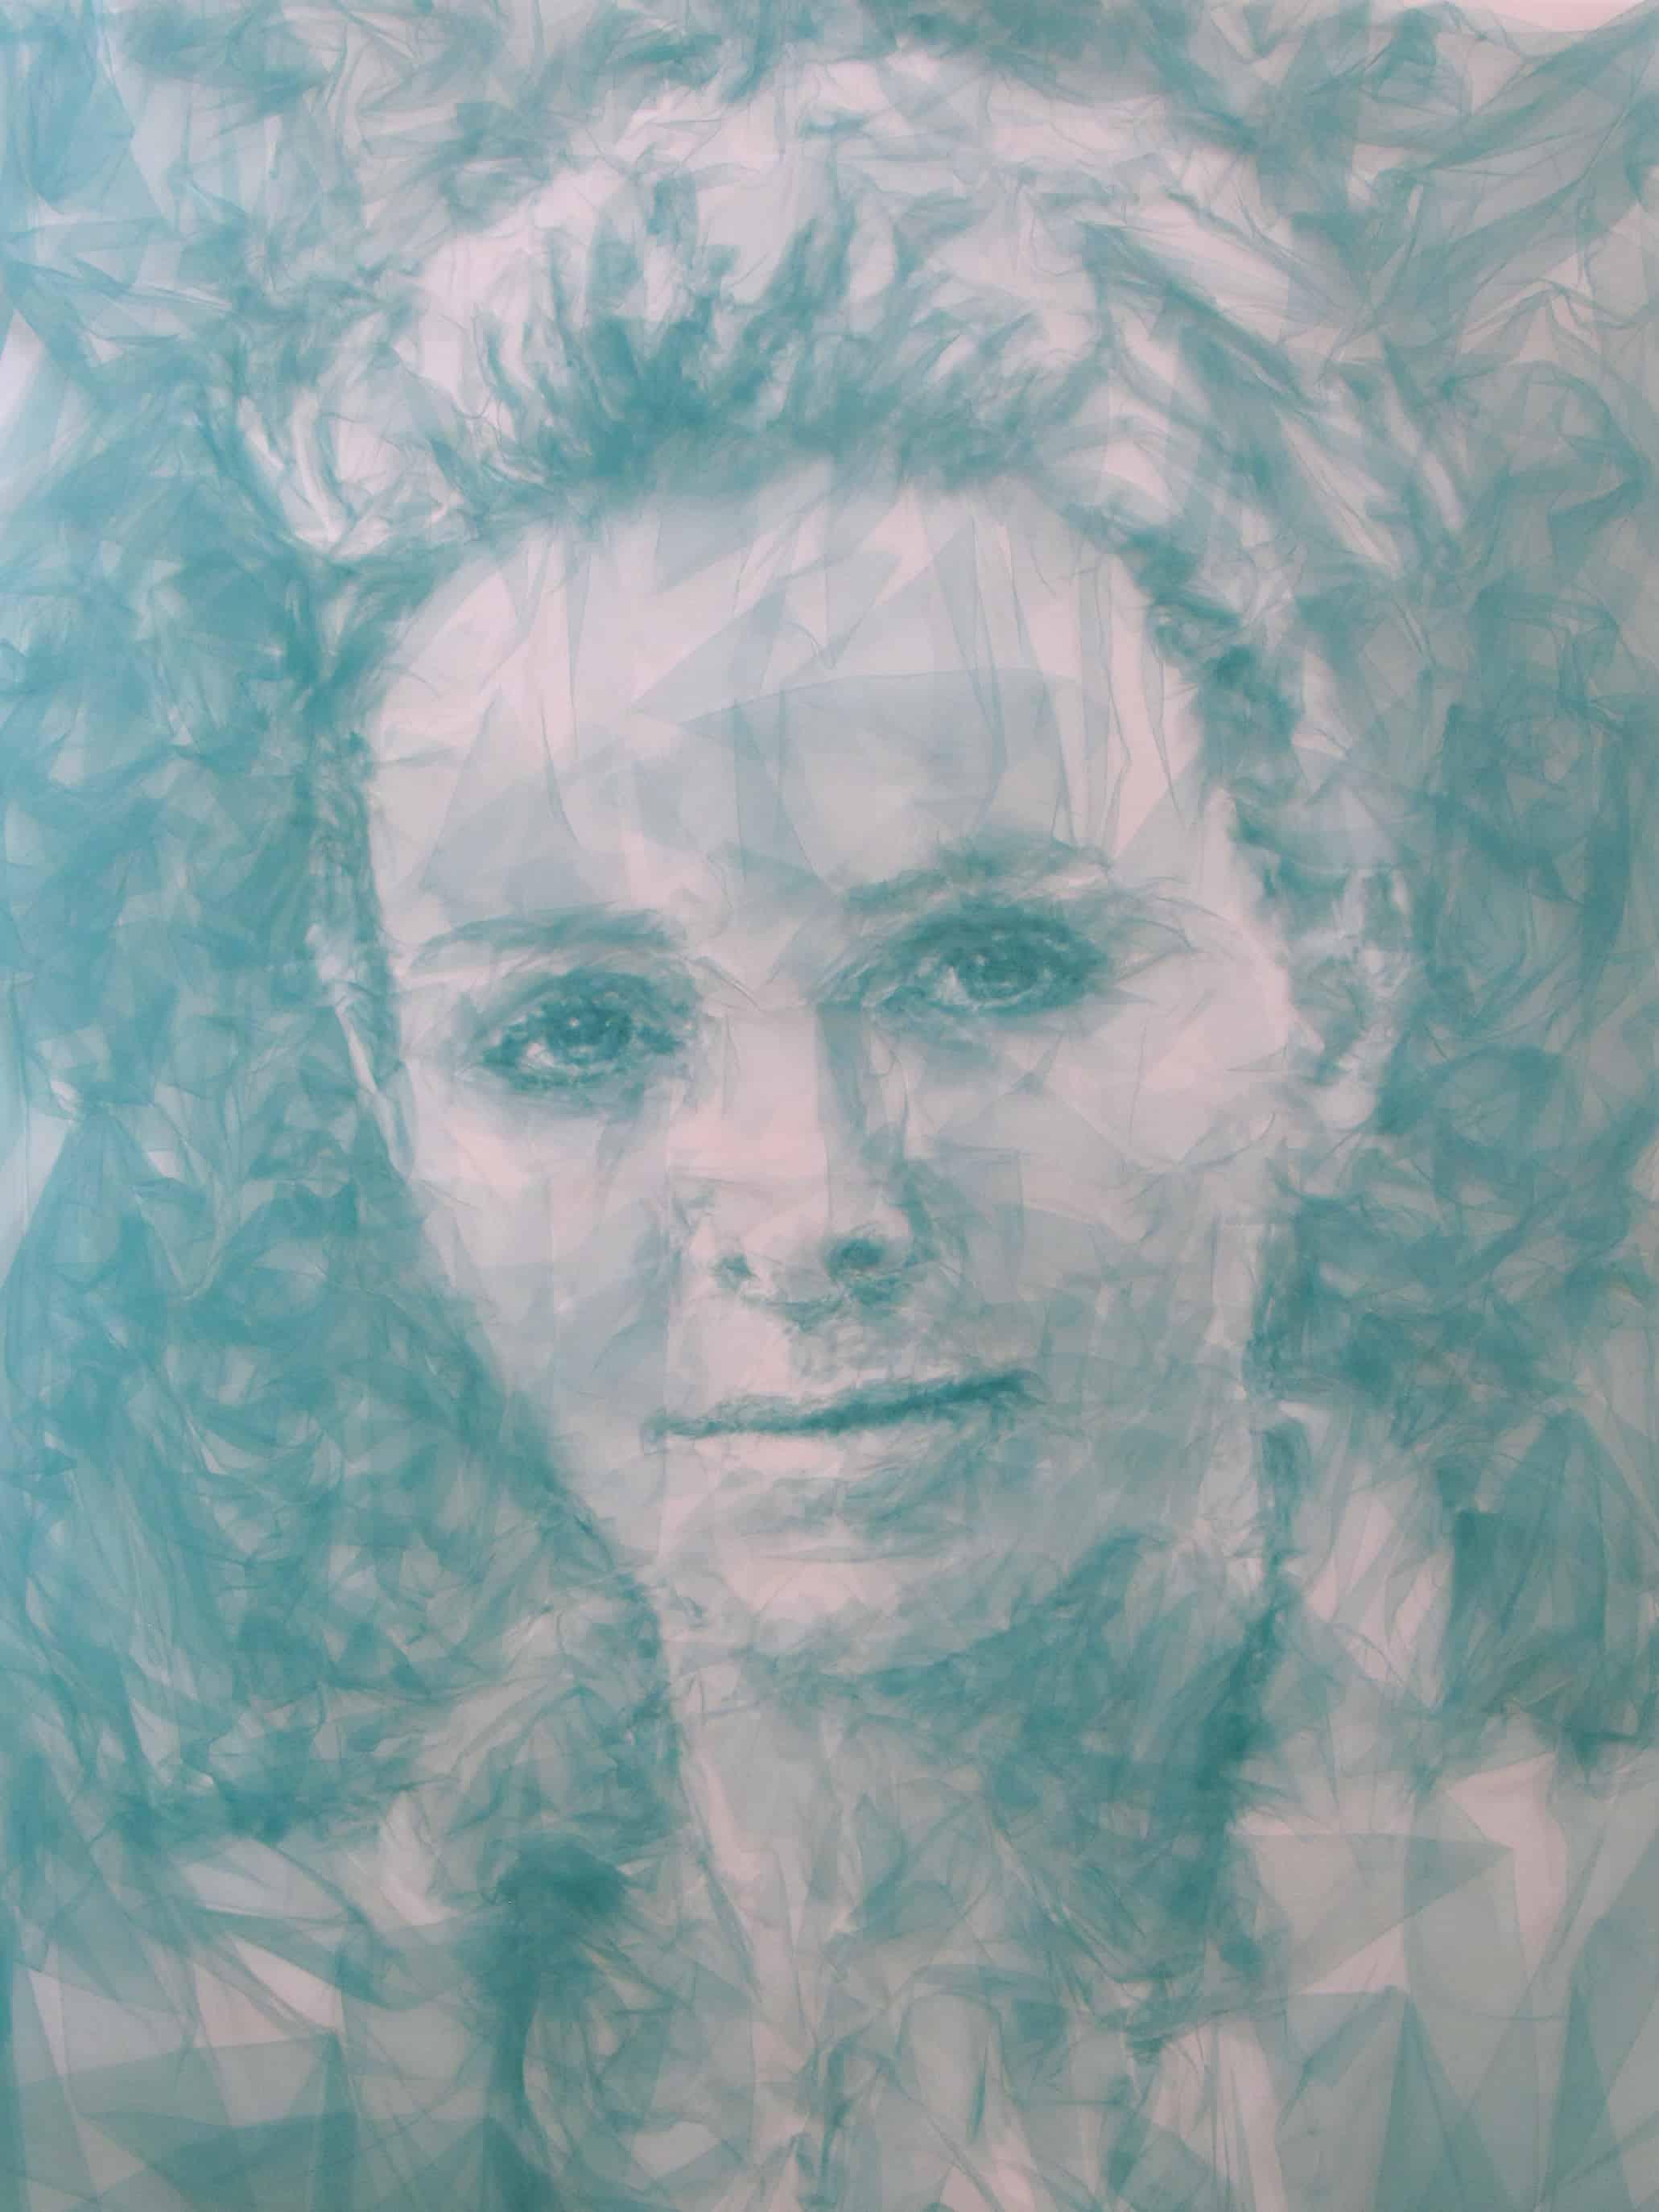 Portraits, by Benjamin Shine